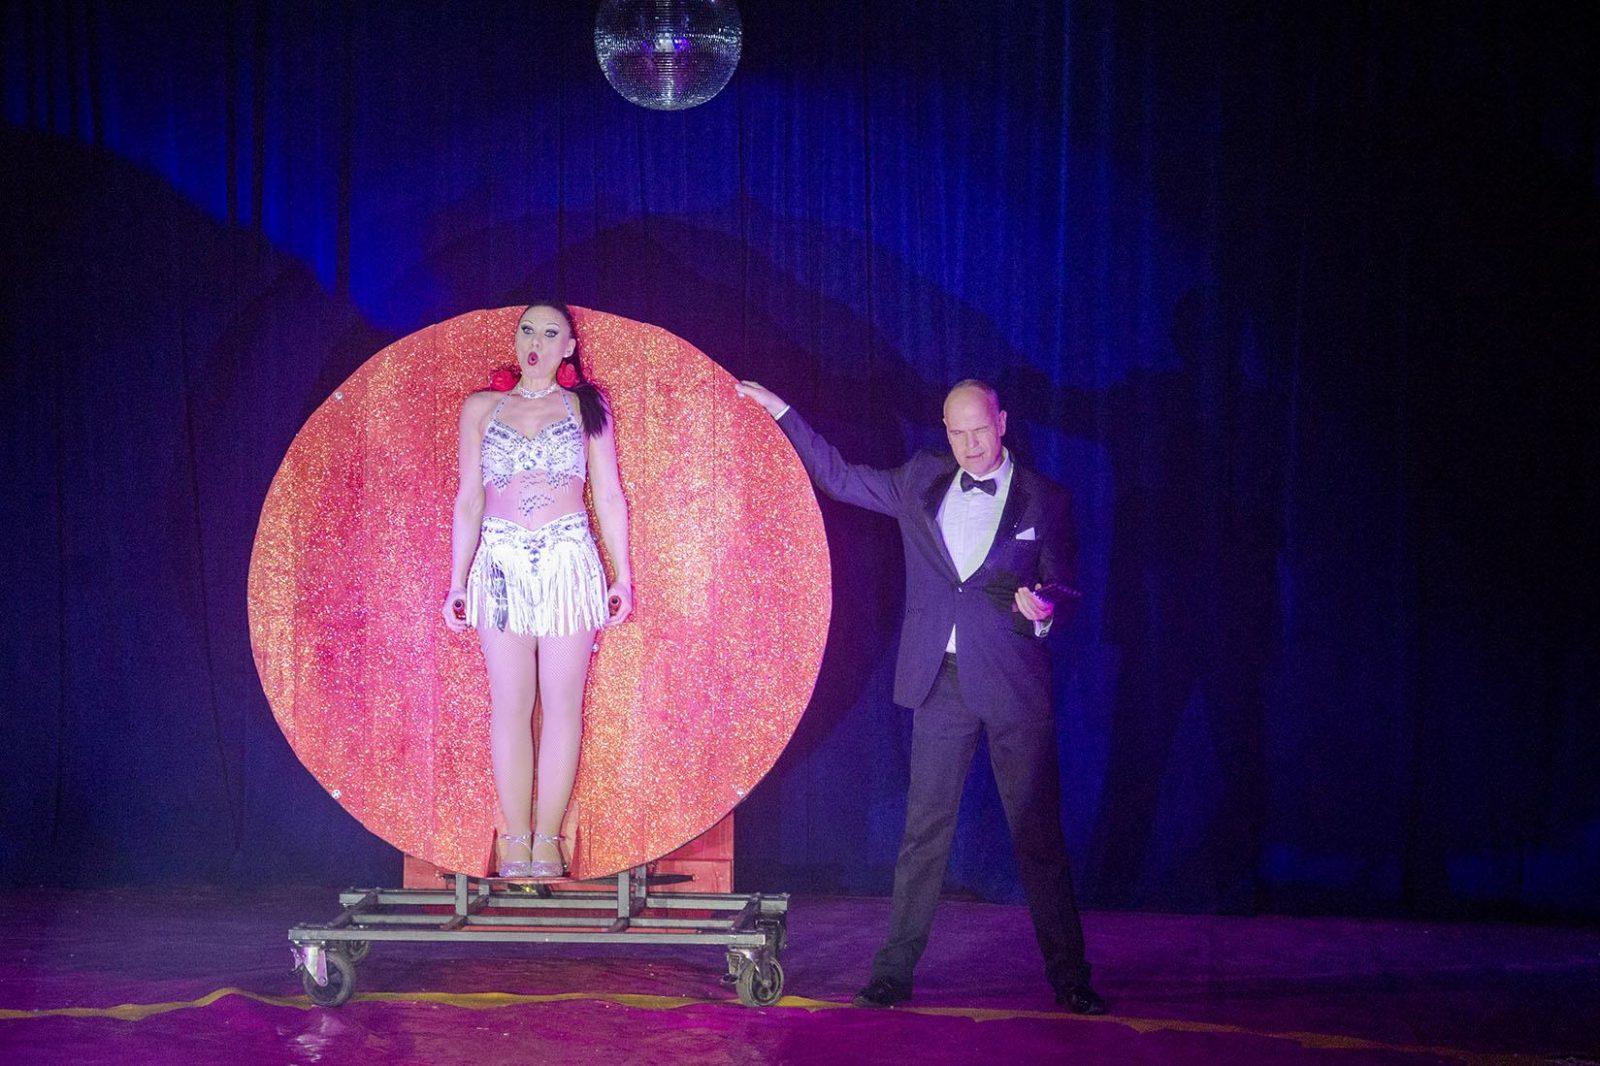 knife show paulos circus